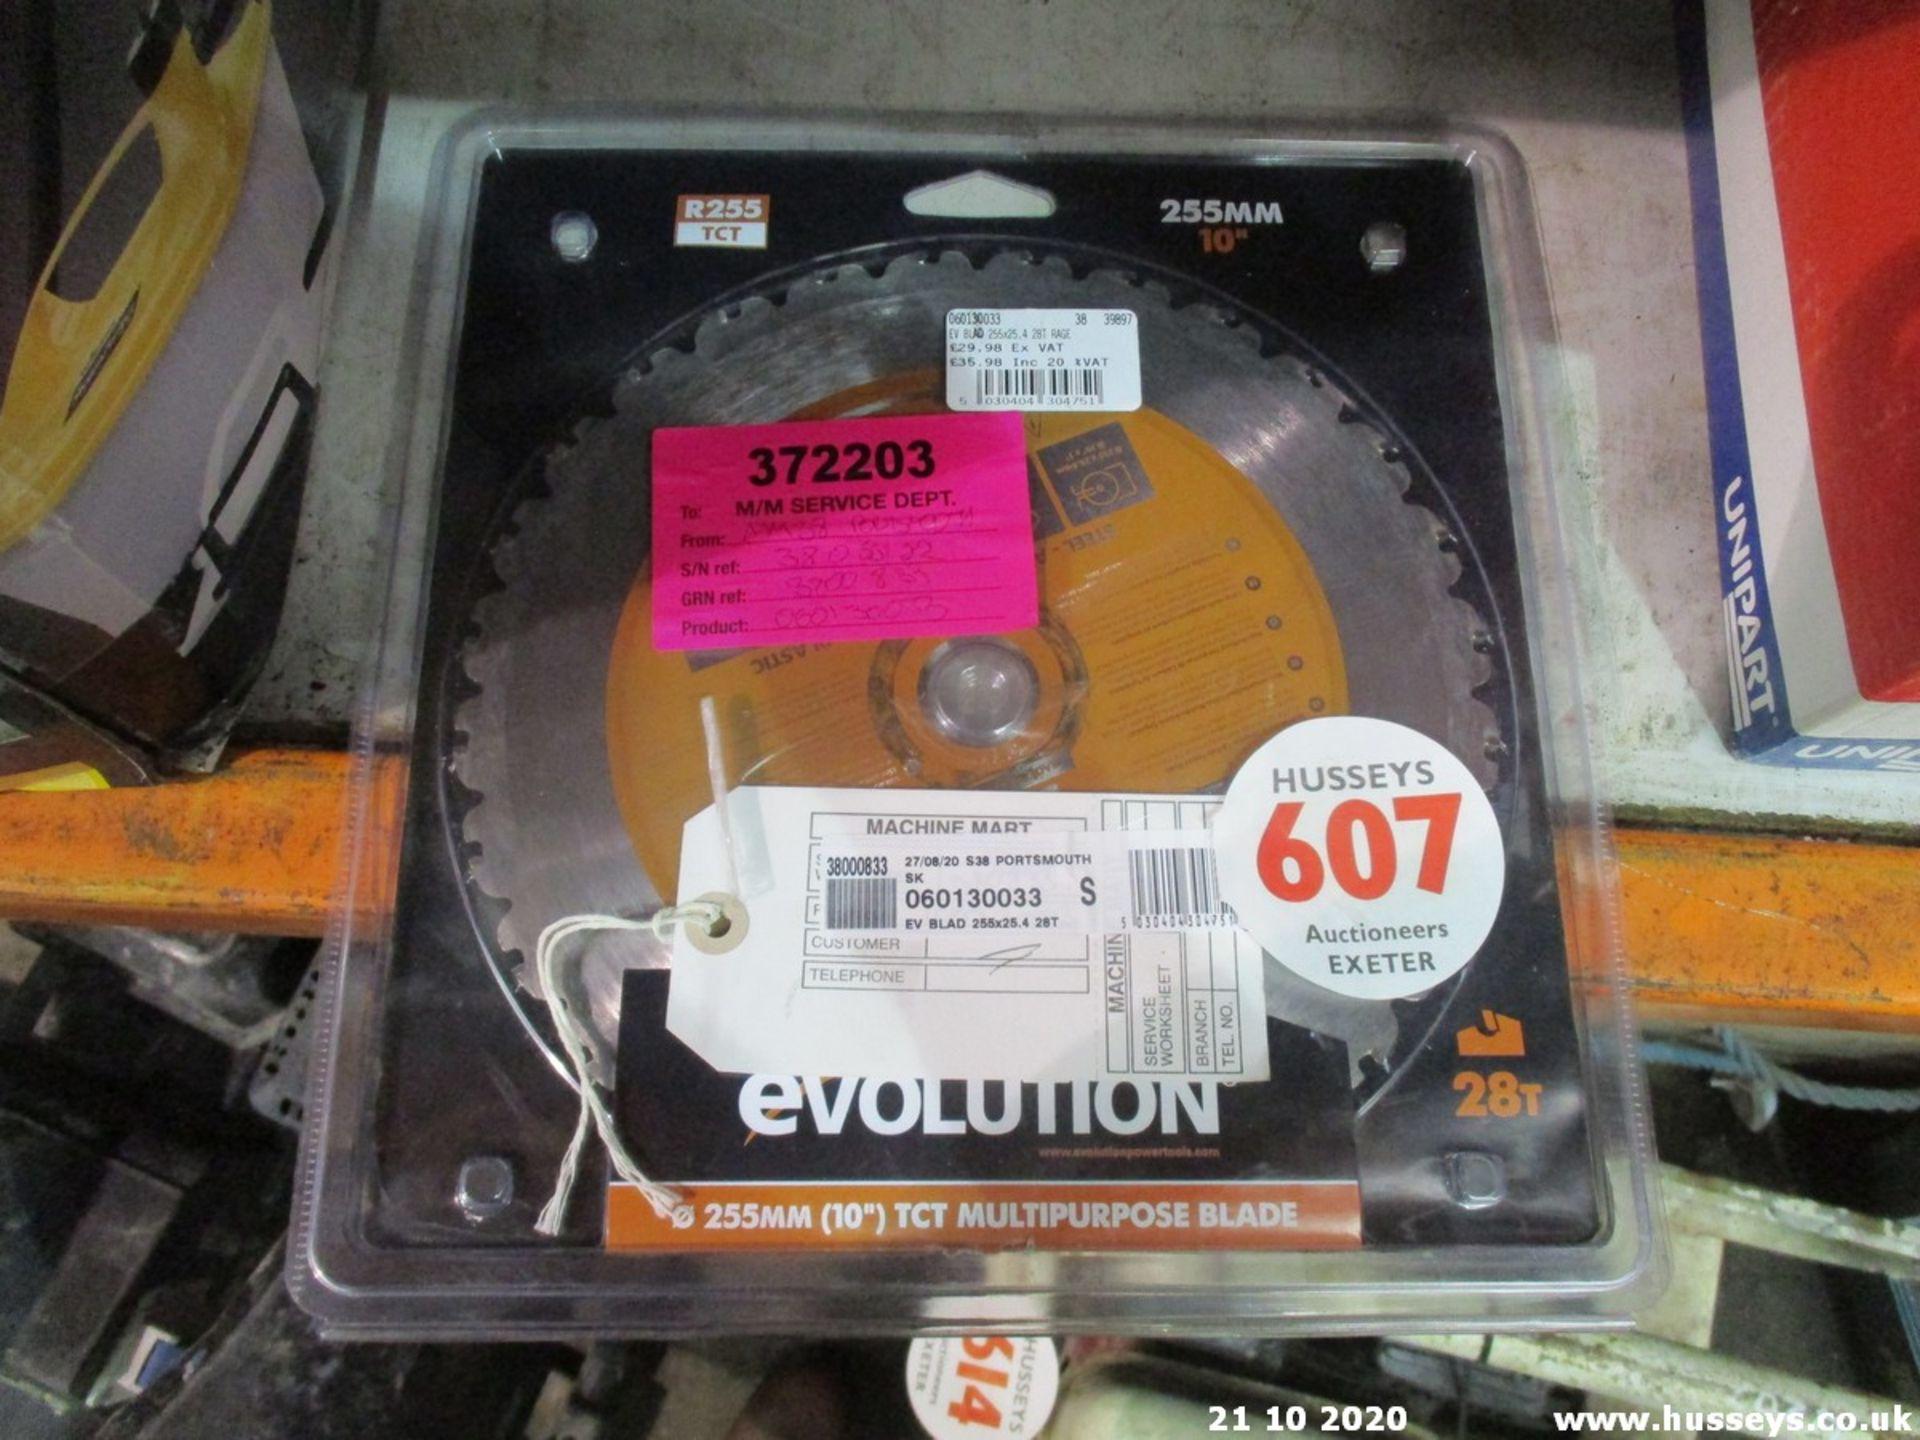 EVOLOUTION SAW BLADE